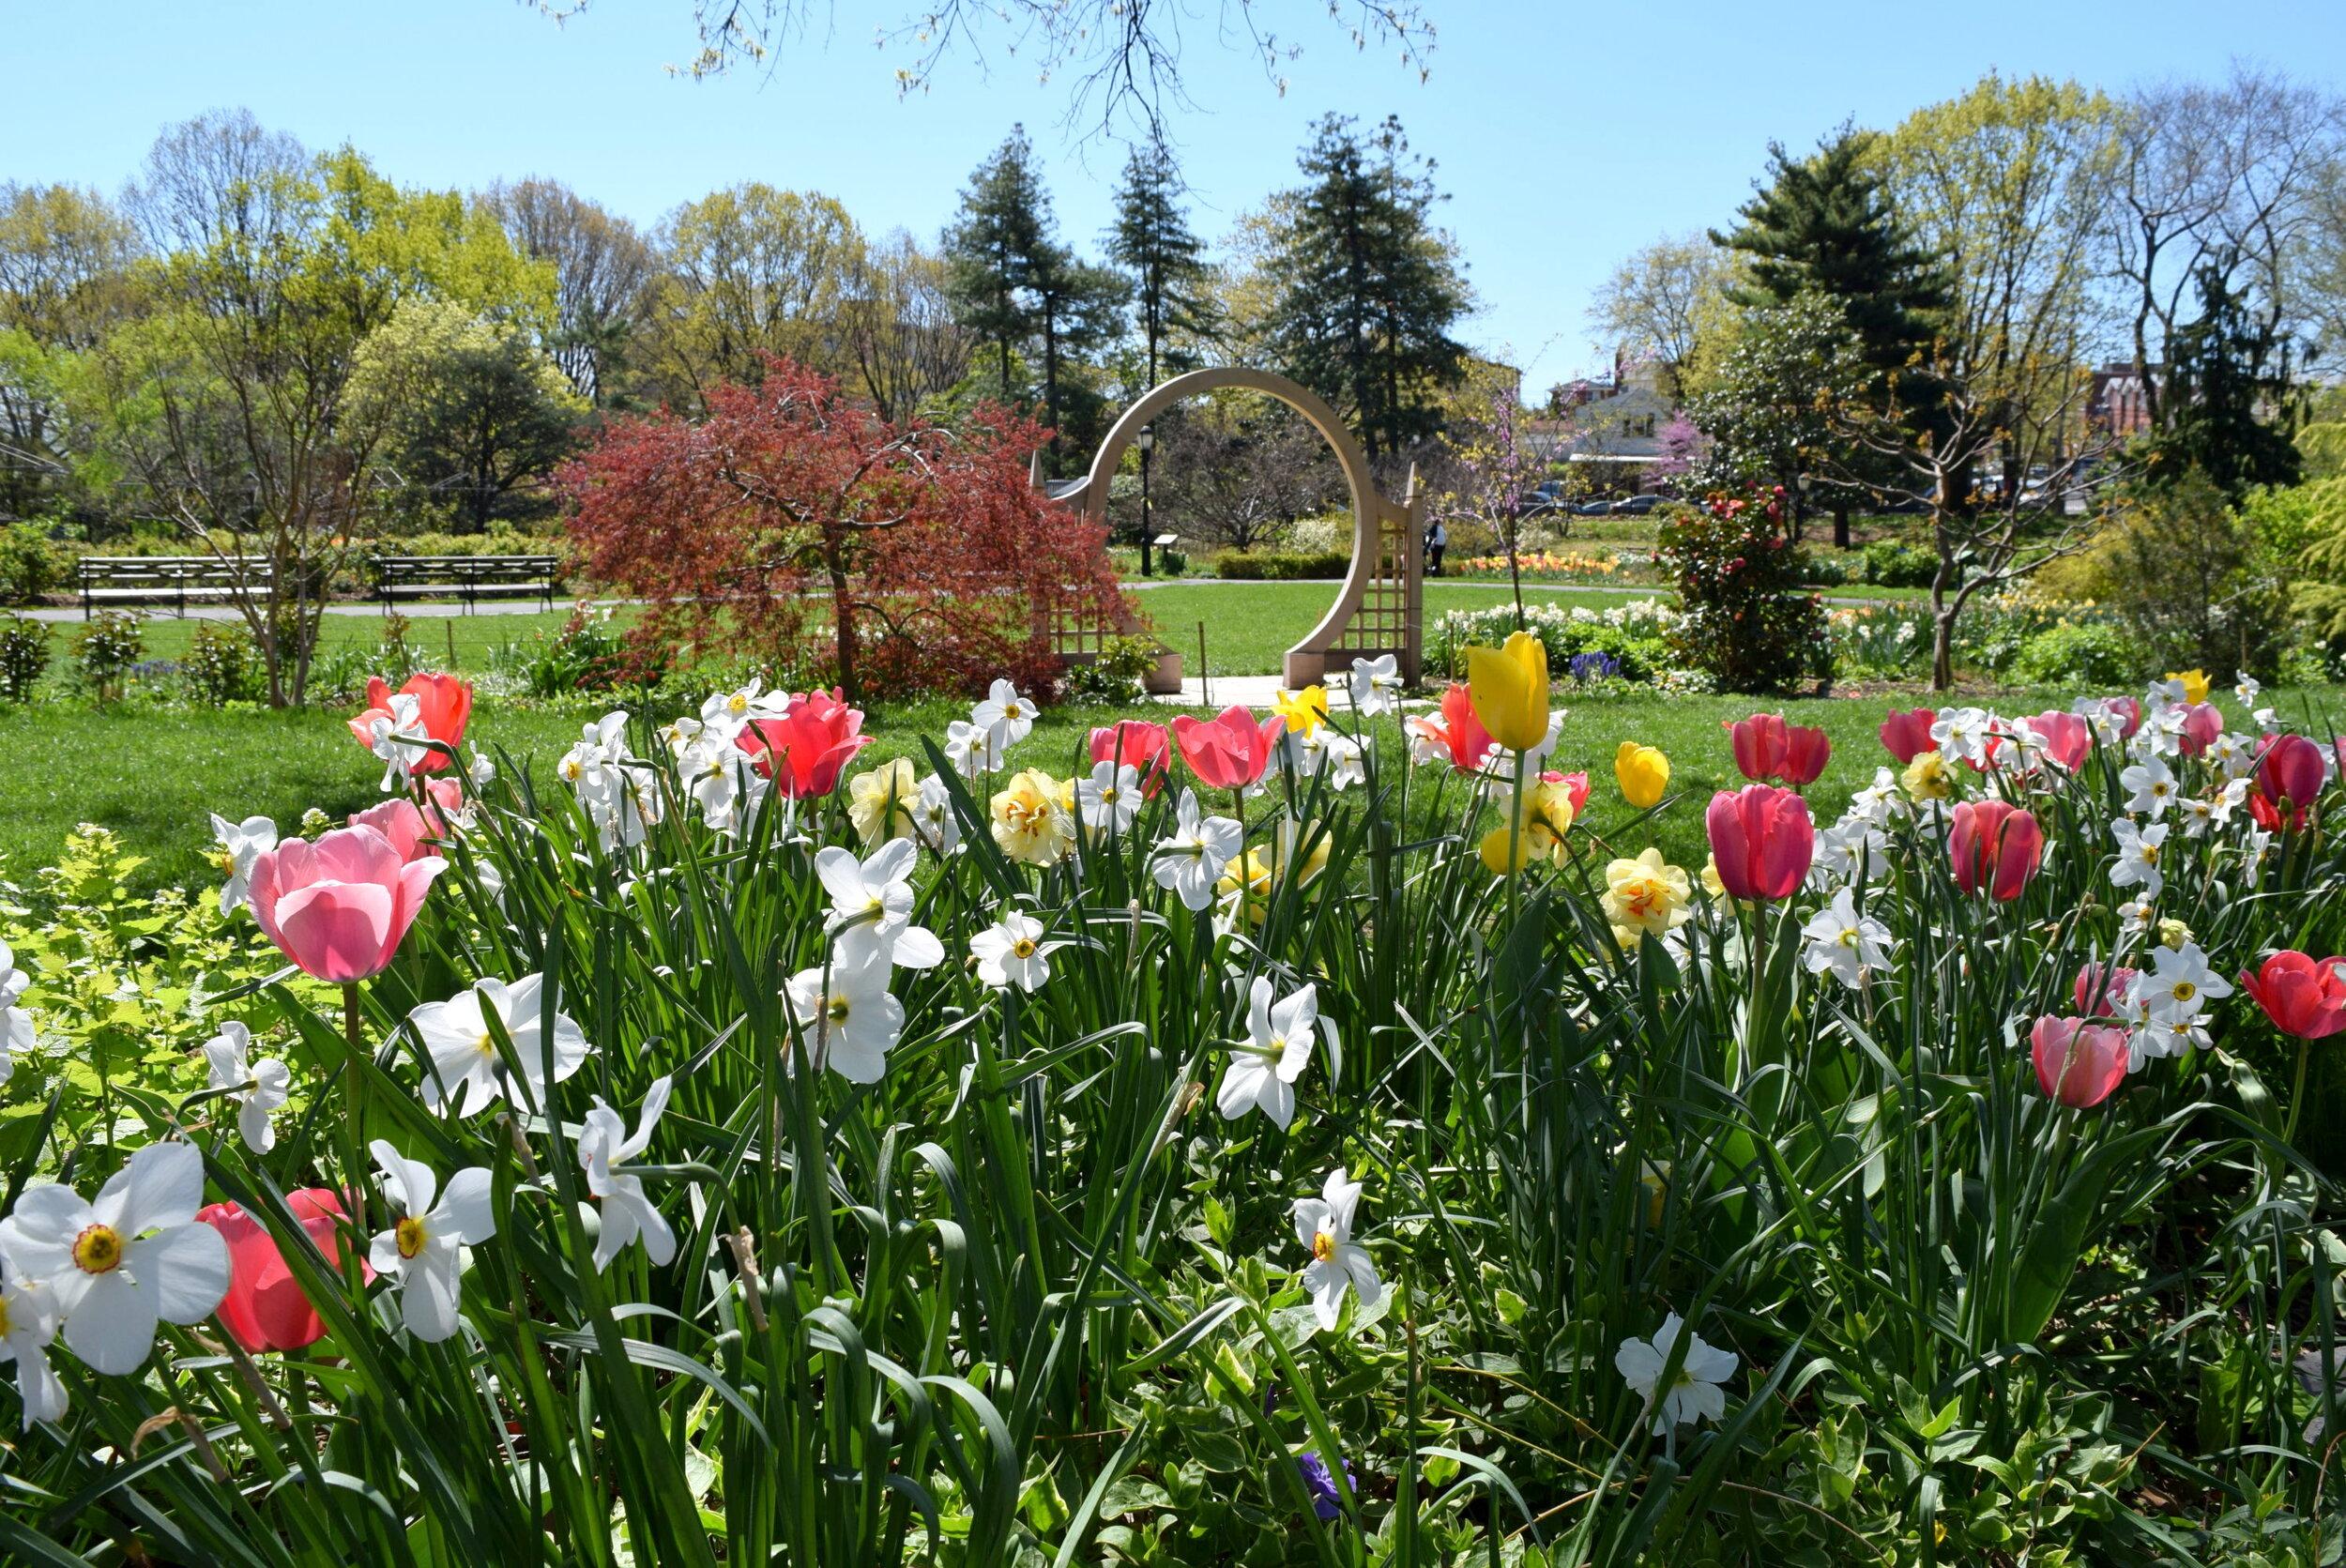 First-Weekend-tulipdaff_CREDIT-Anne-Tan-Detchkov0.jpg